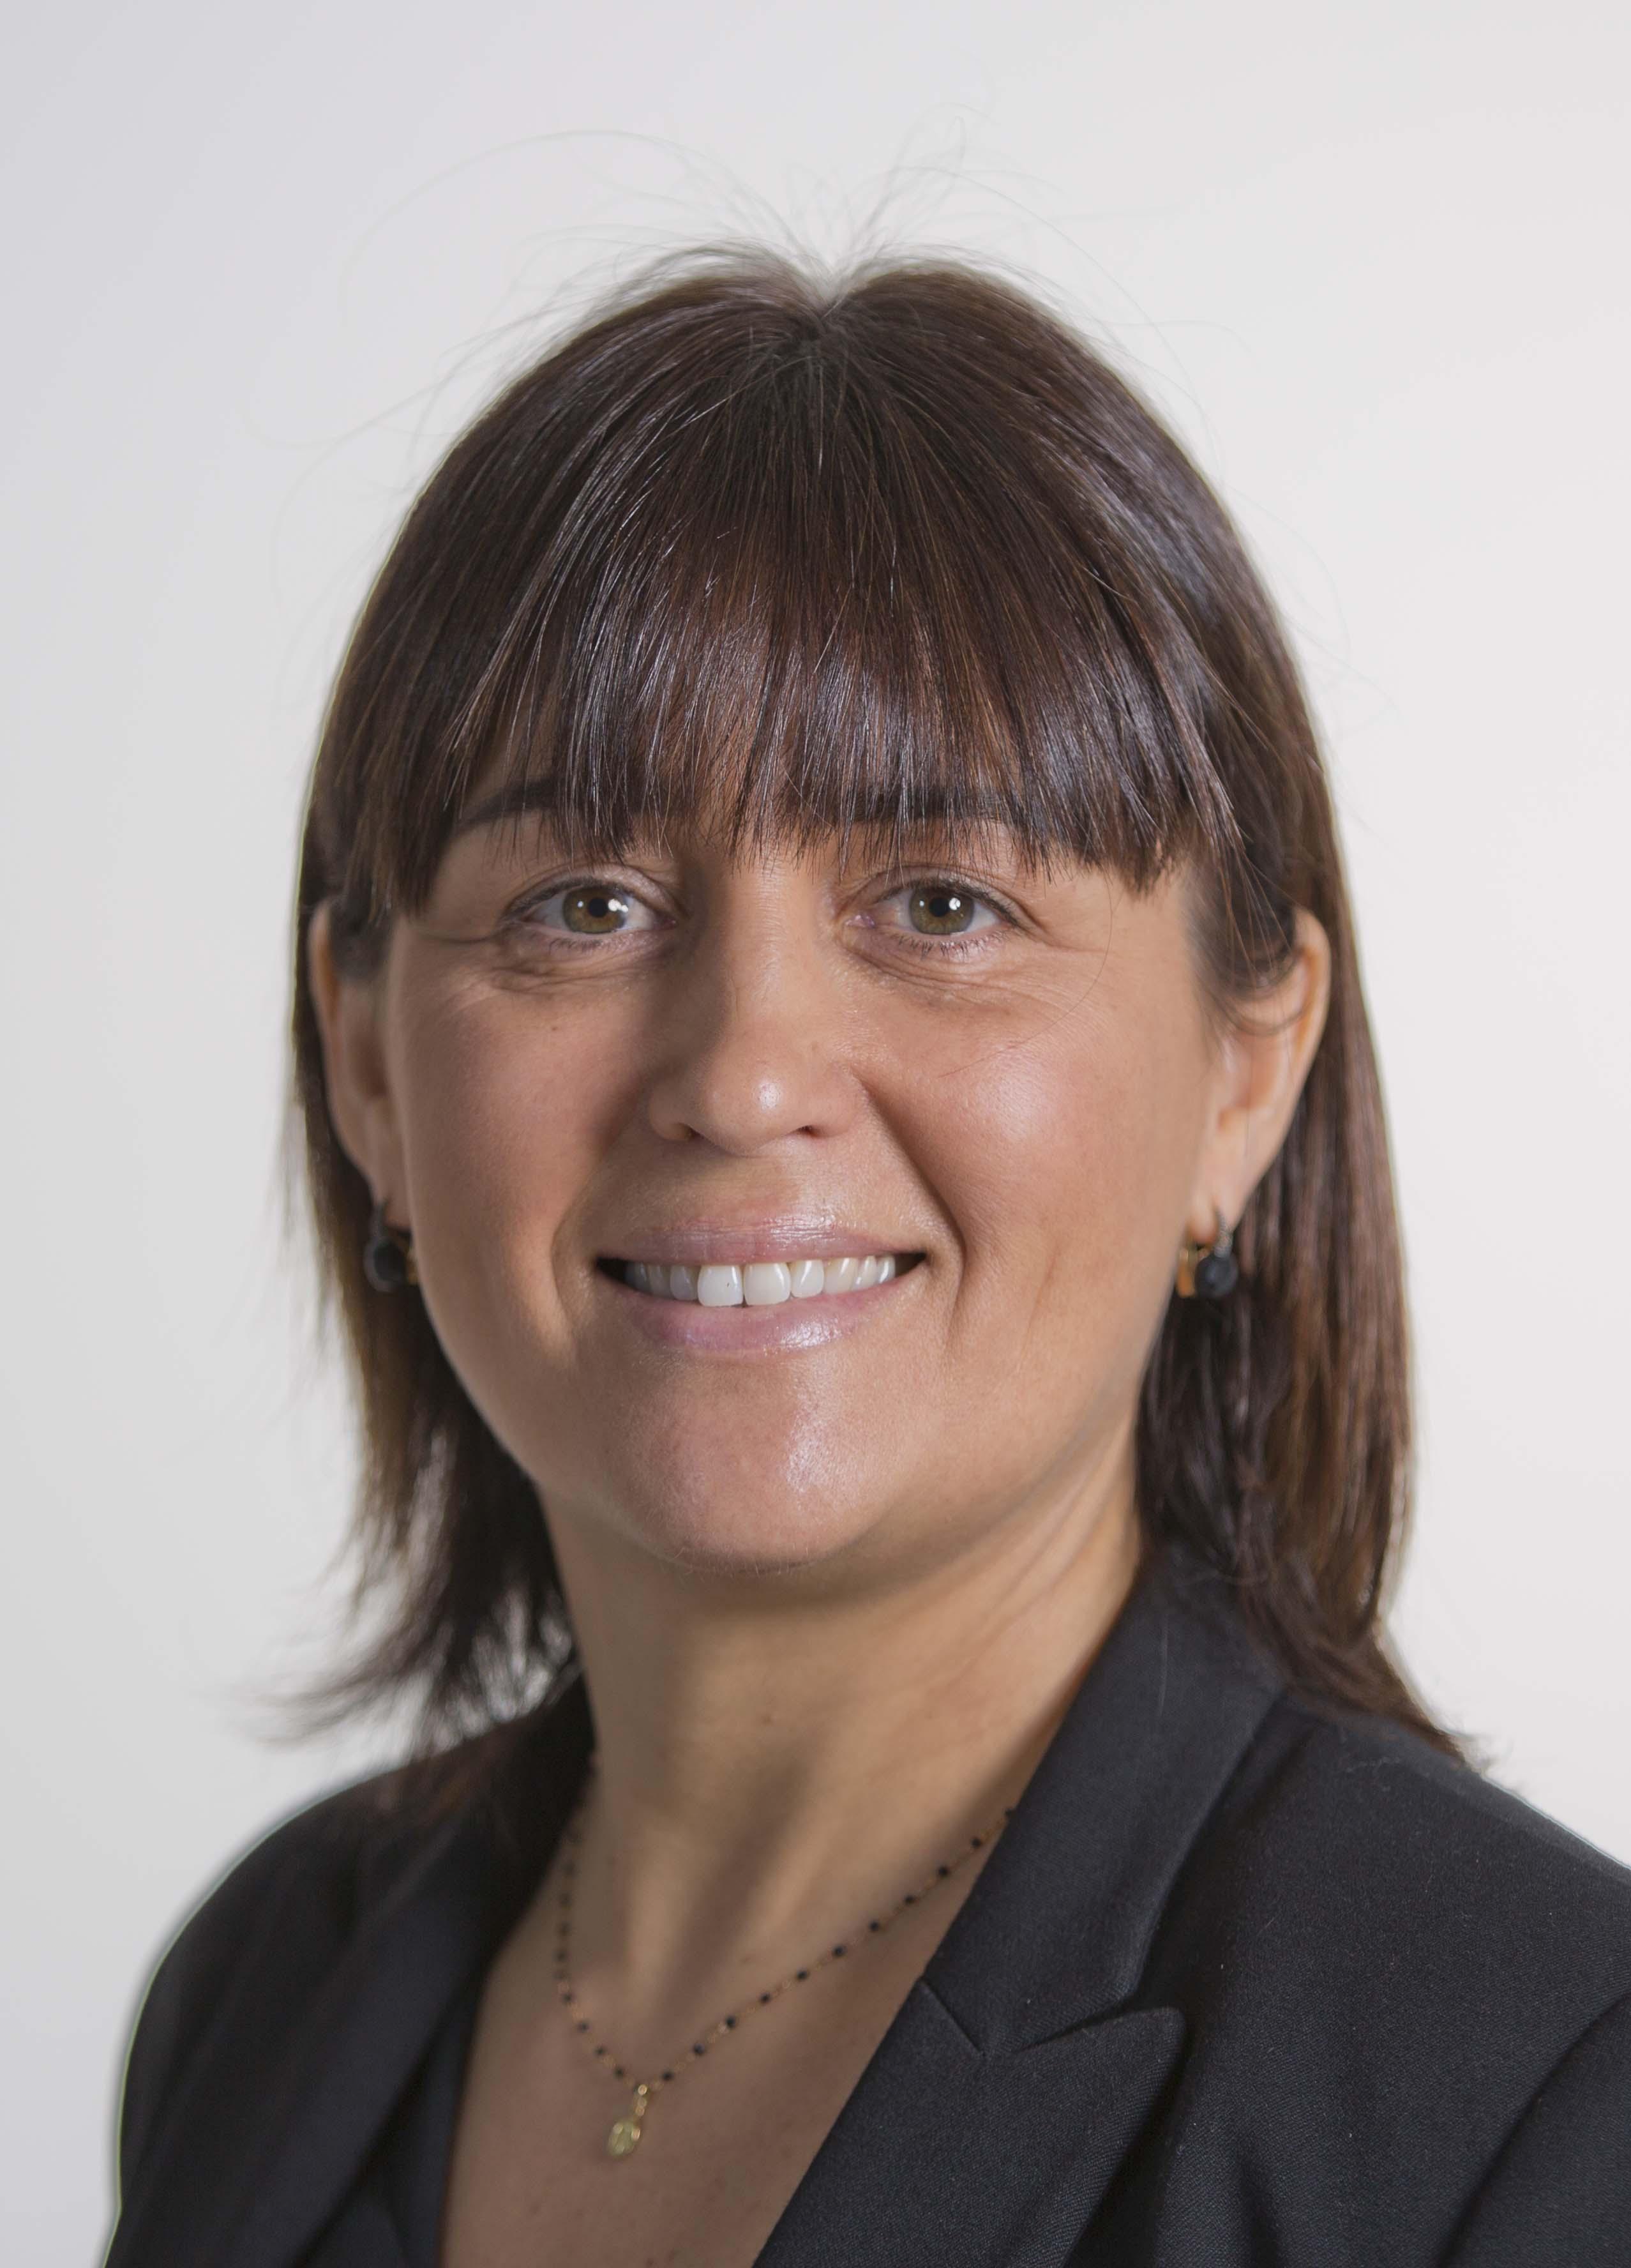 Christelle Combette